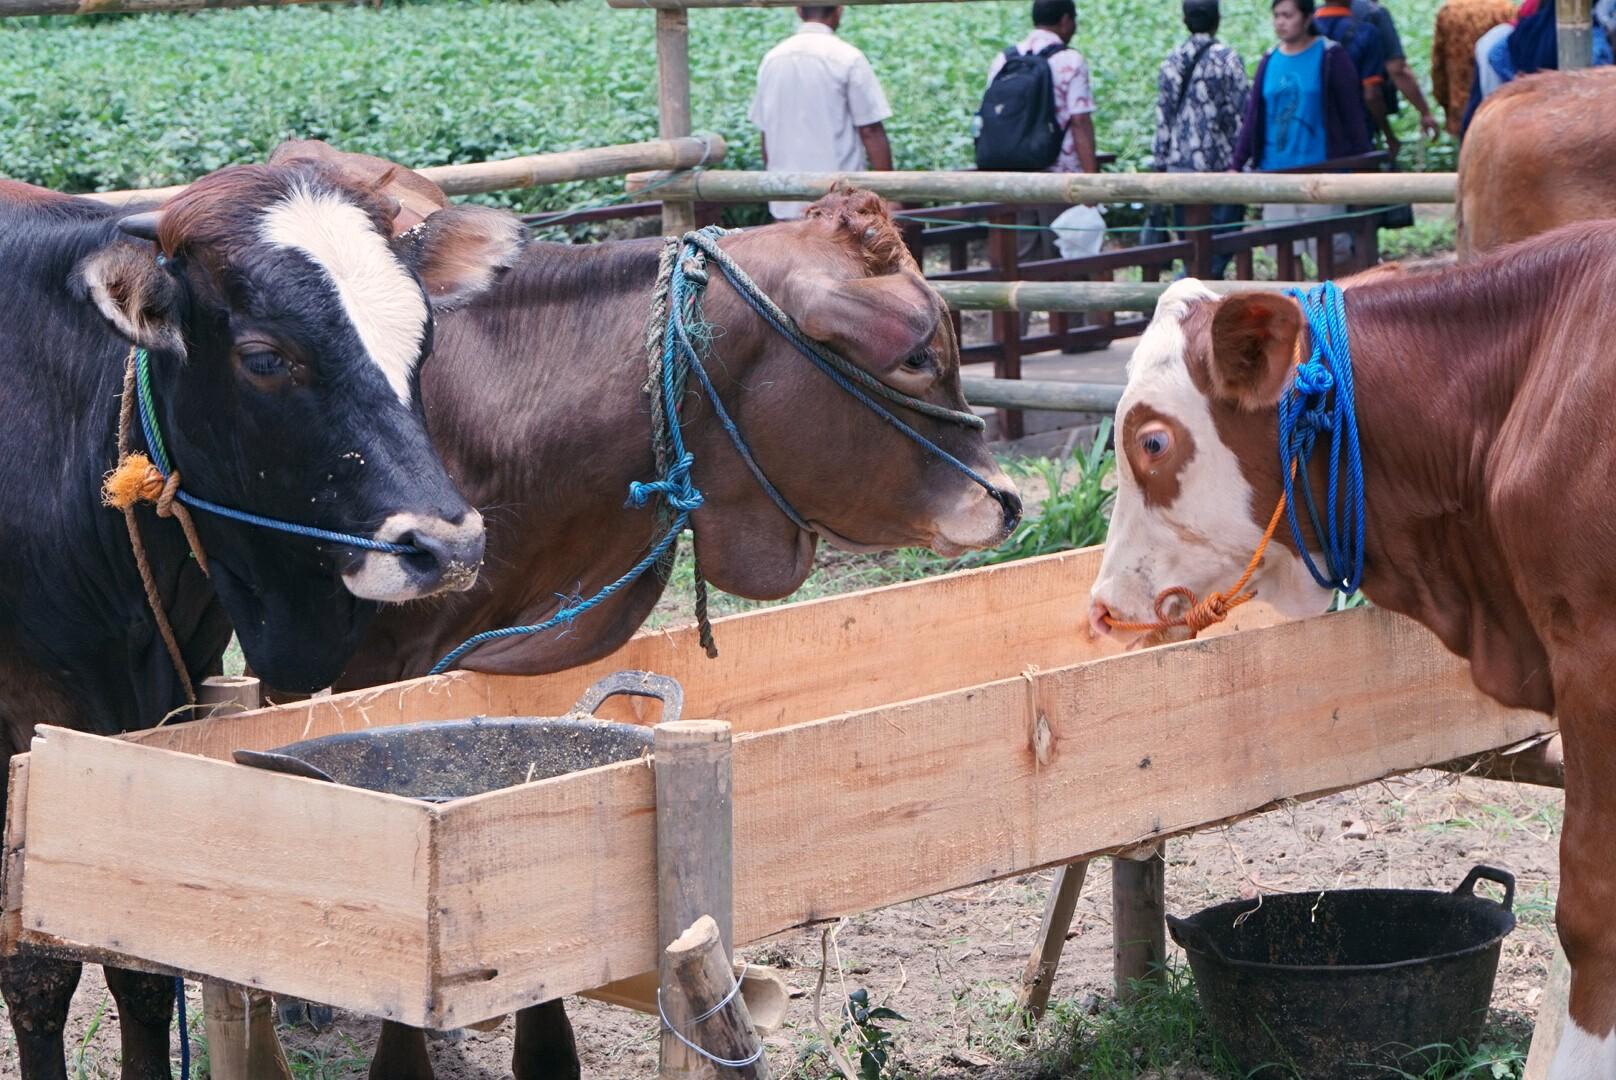 Sudut peternakan di HPS ke-36 (Foto: Bagus DR / GNFI)